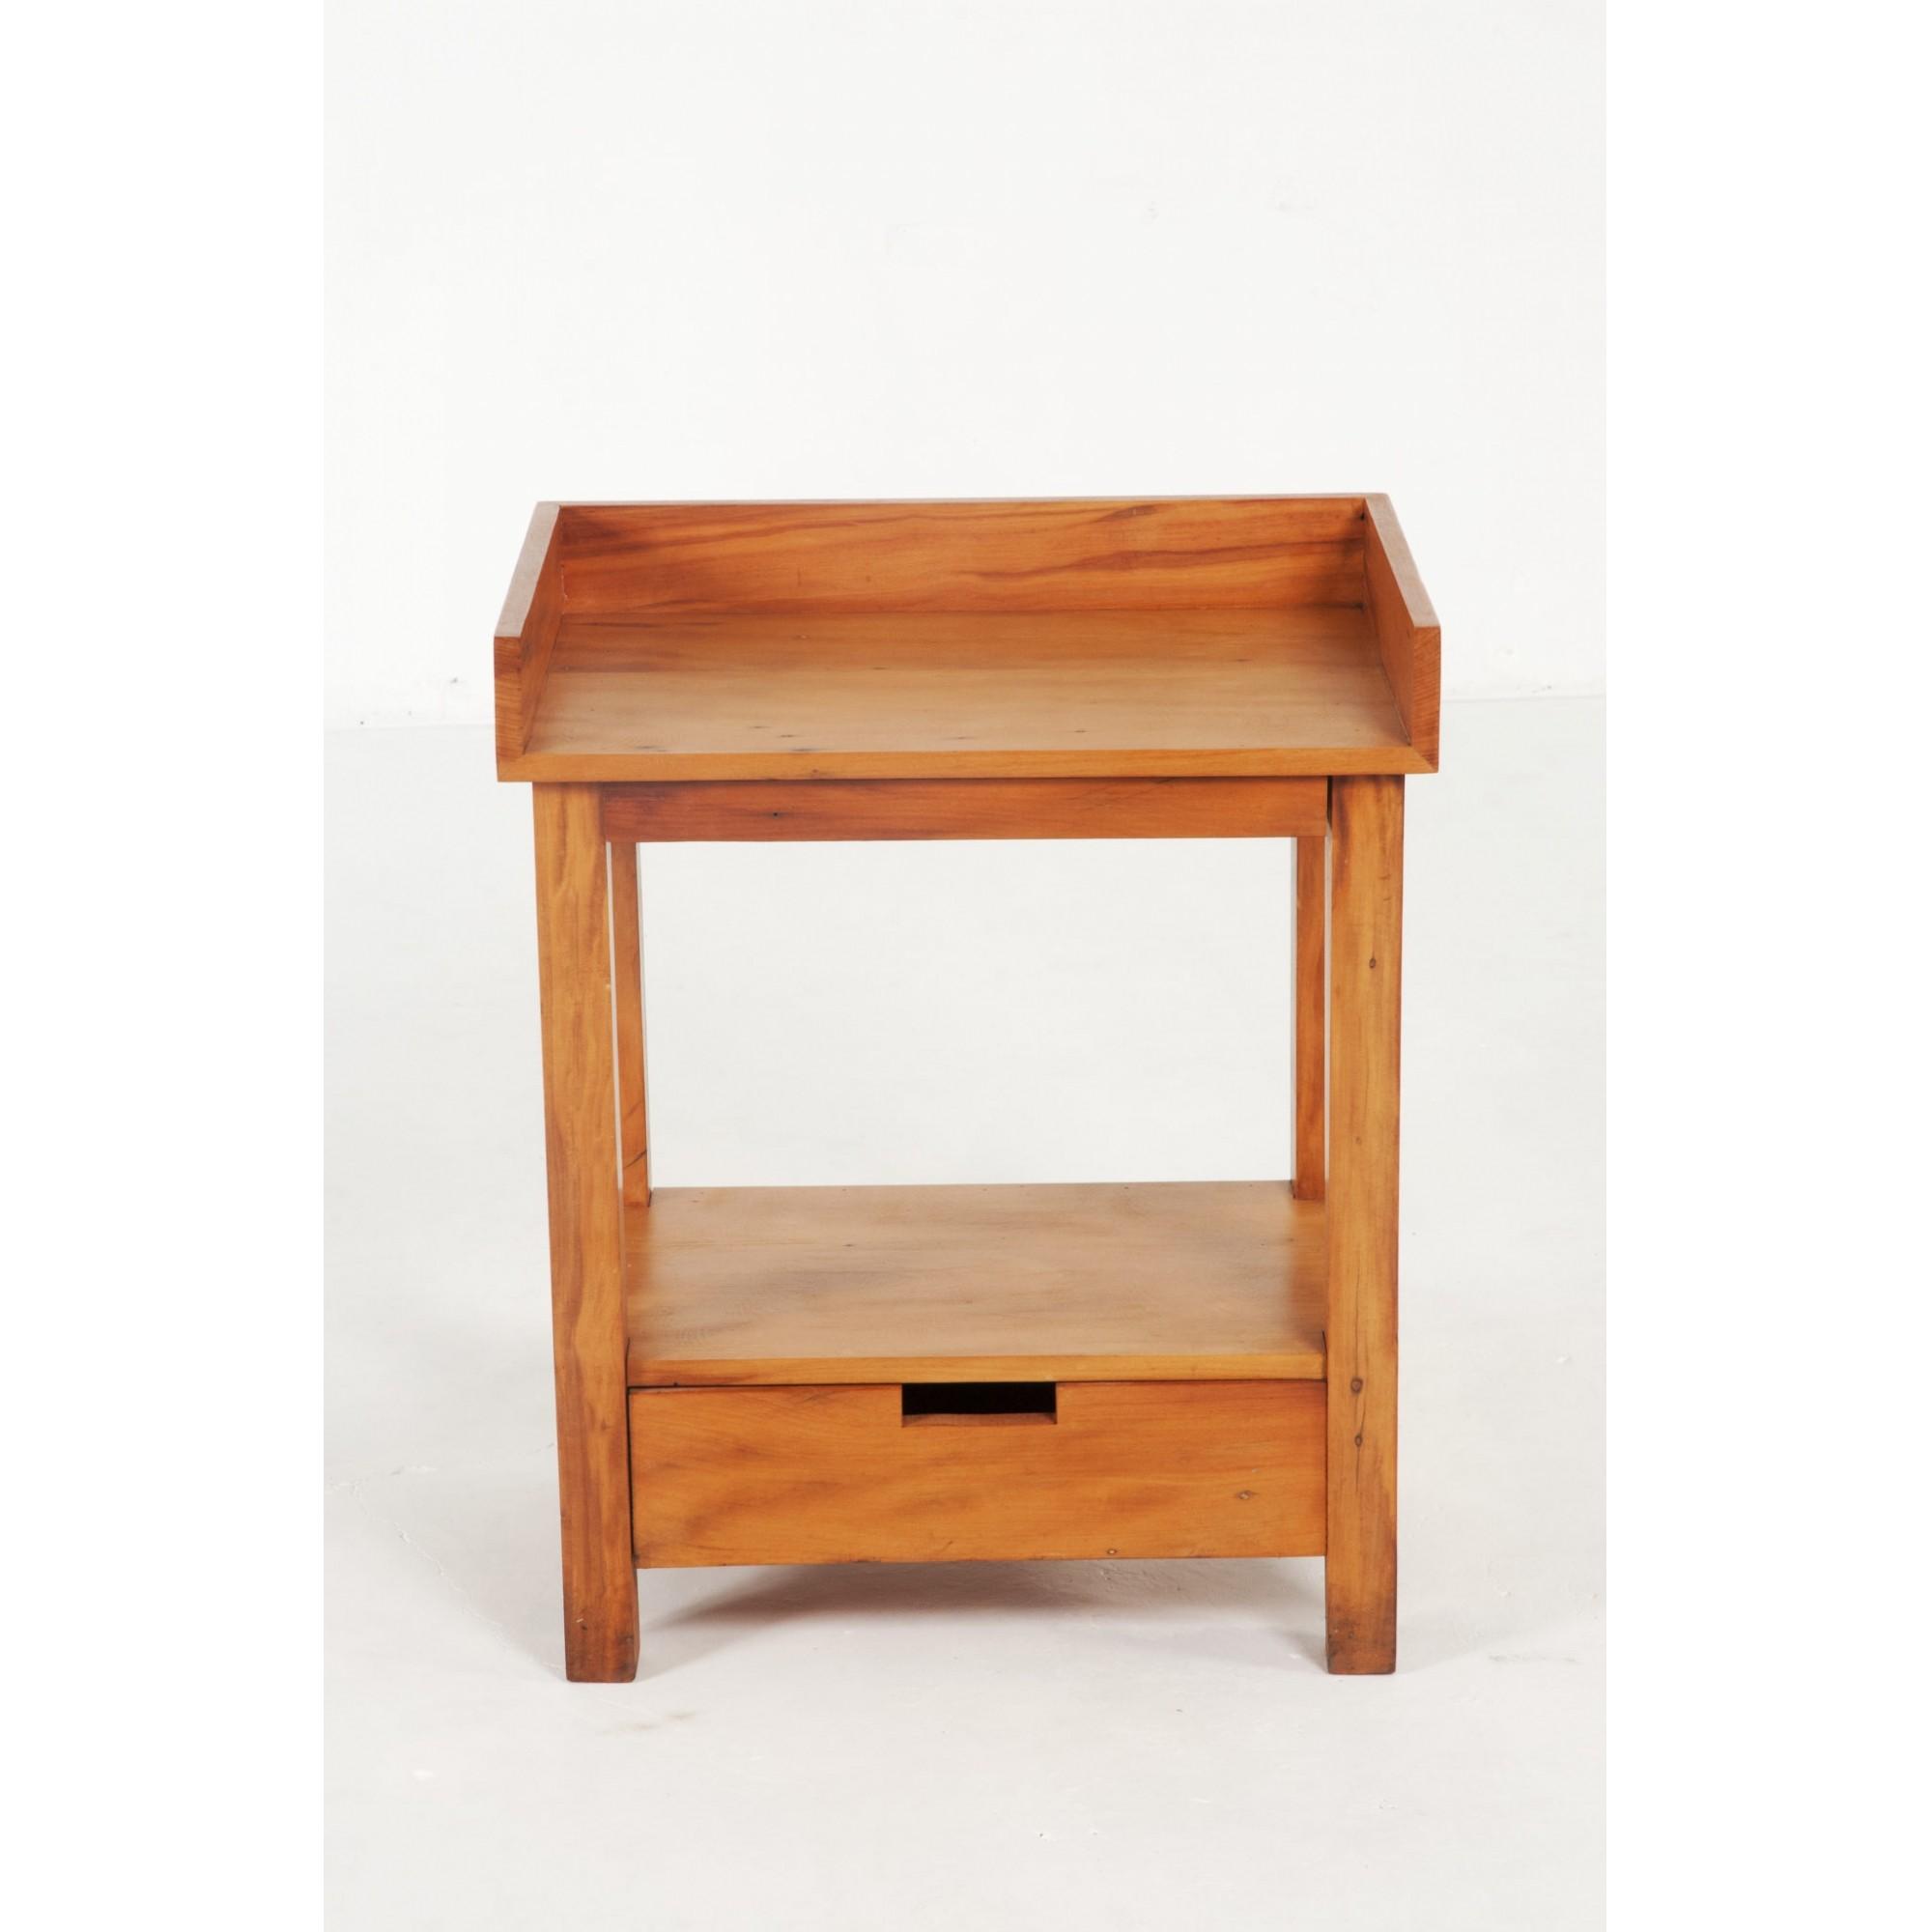 Mesa lateral com gaveta embaixo